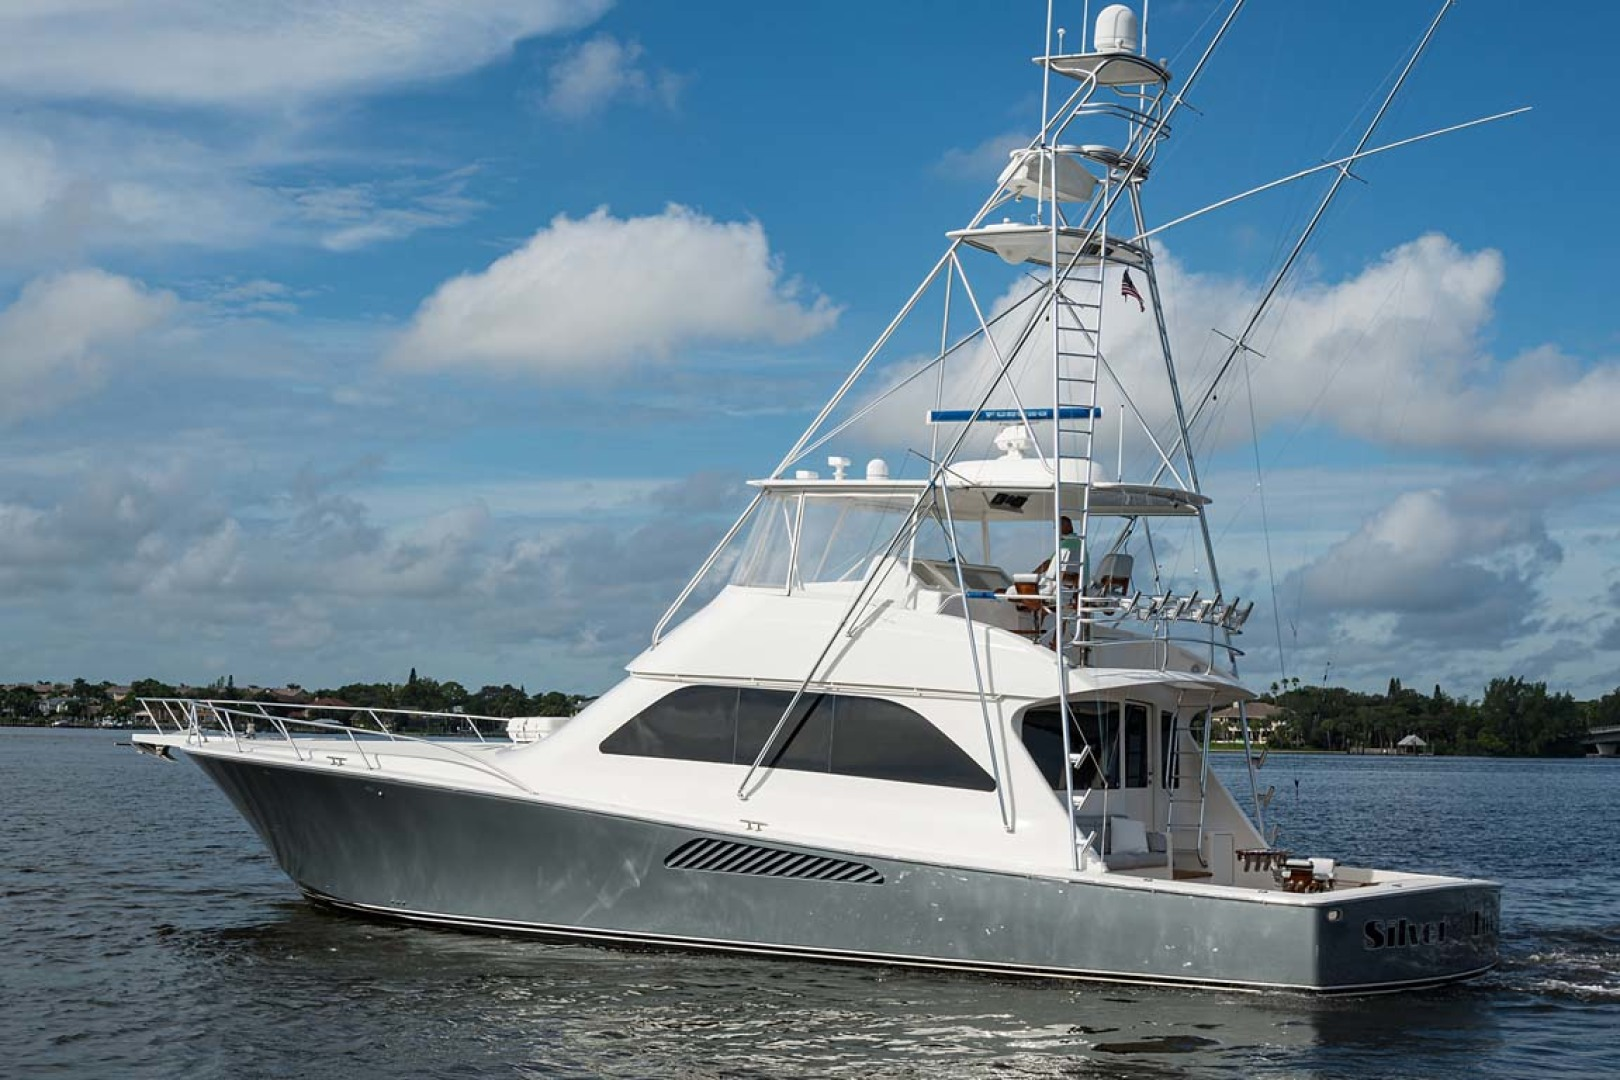 Viking-Sportfish 2007-Silver Fox Stuart-Florida-United States-Port View-1255895   Thumbnail